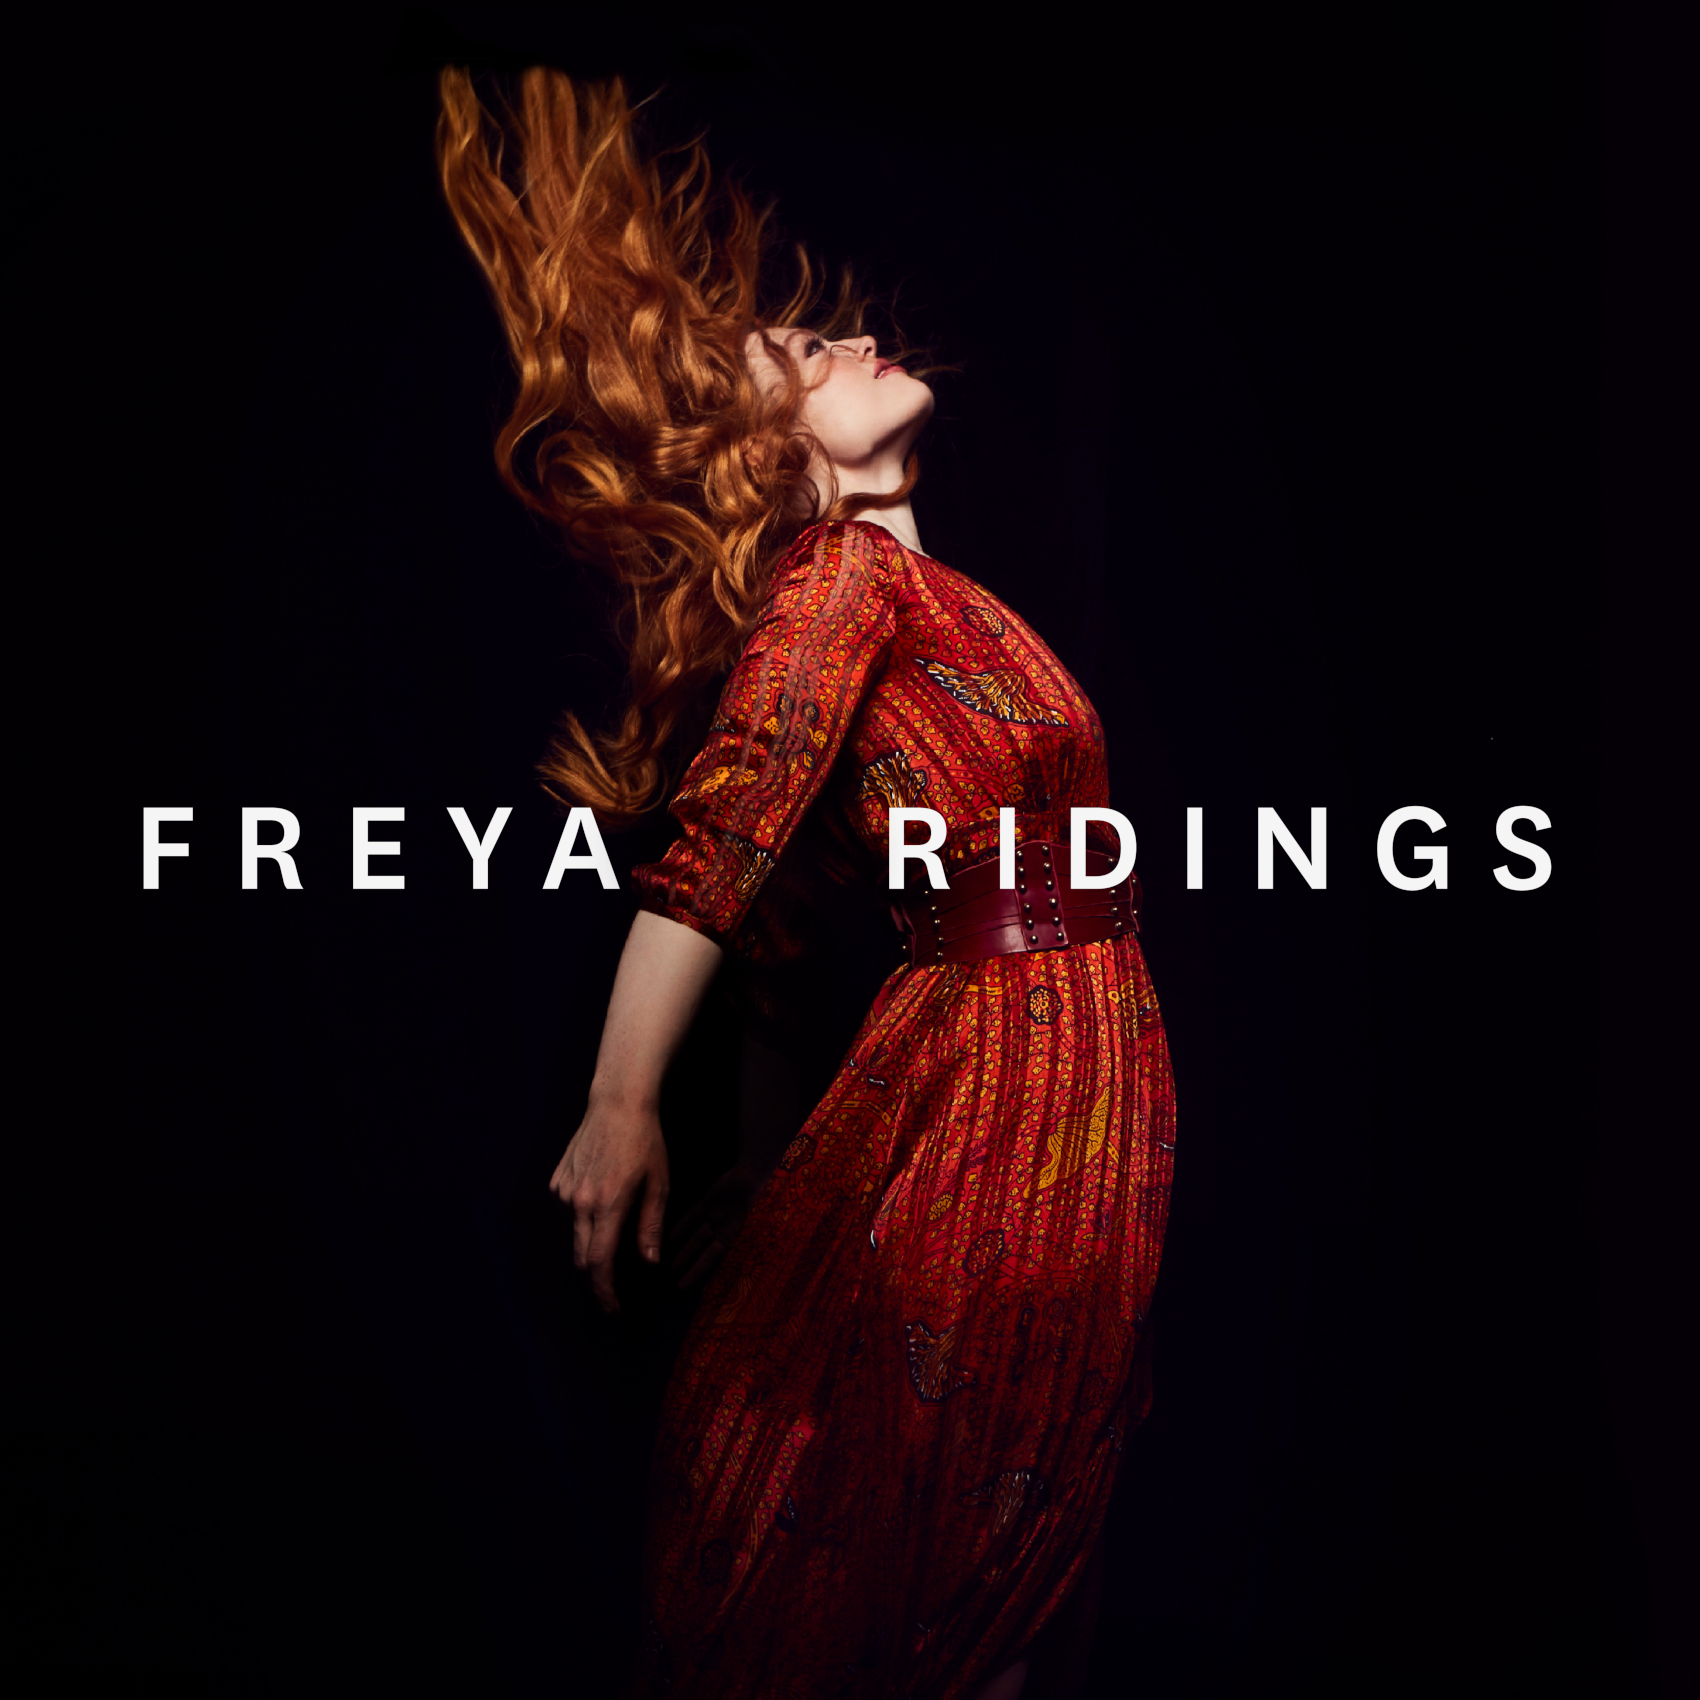 Freya Ridings śpiewa Billie Eilish